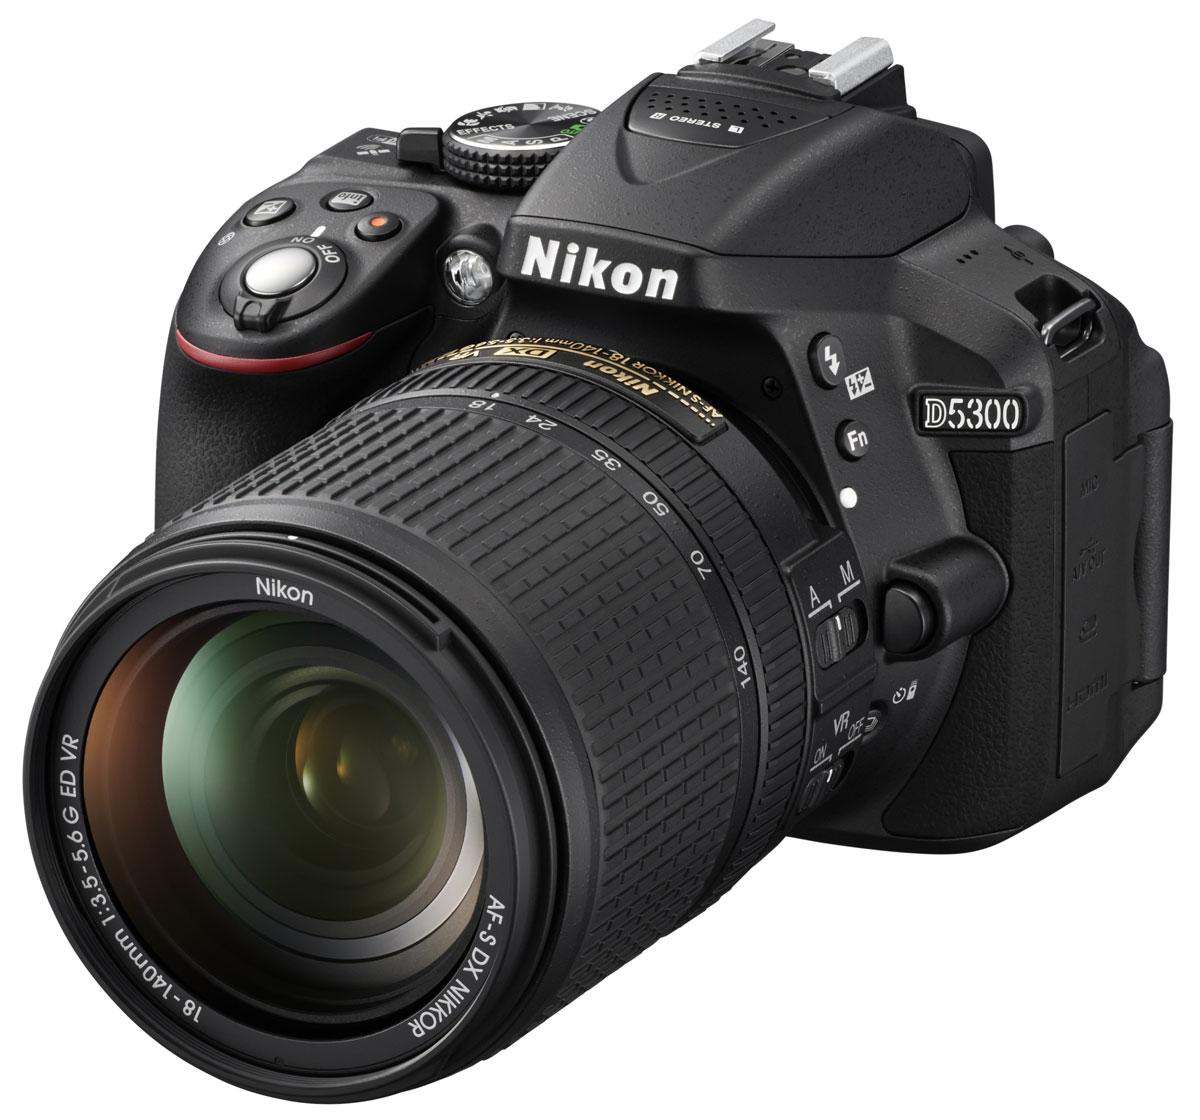 Nikon D5300 Kit 18-140 VR, Black цифровая зеркальная фотокамераVBA370K002